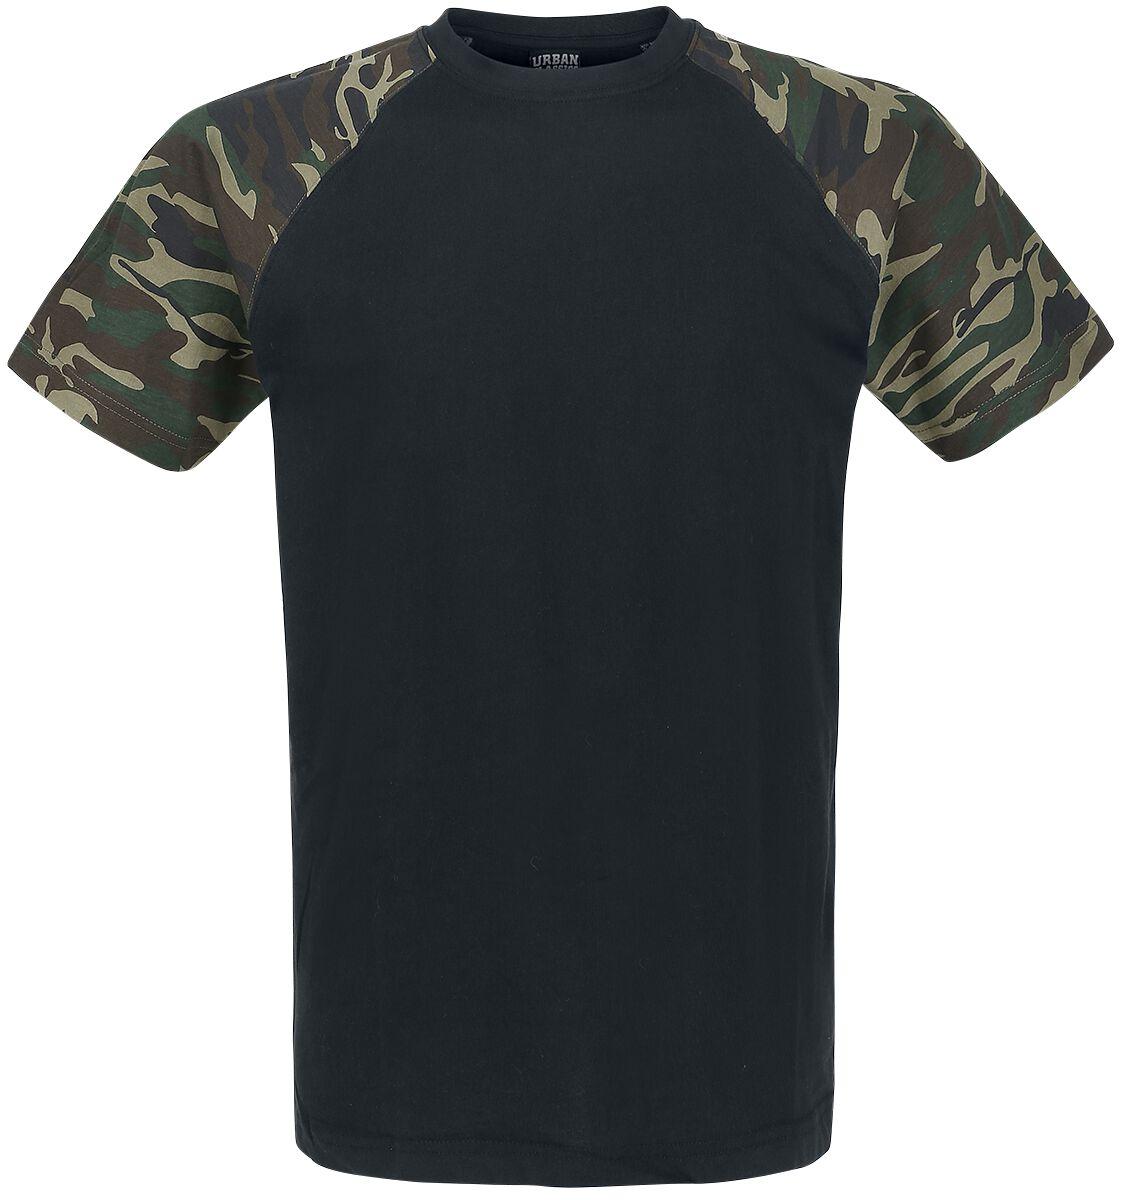 Urban Classics Raglan Contrast Tee T-Shirt schwarz woodland TB639 black/woodland